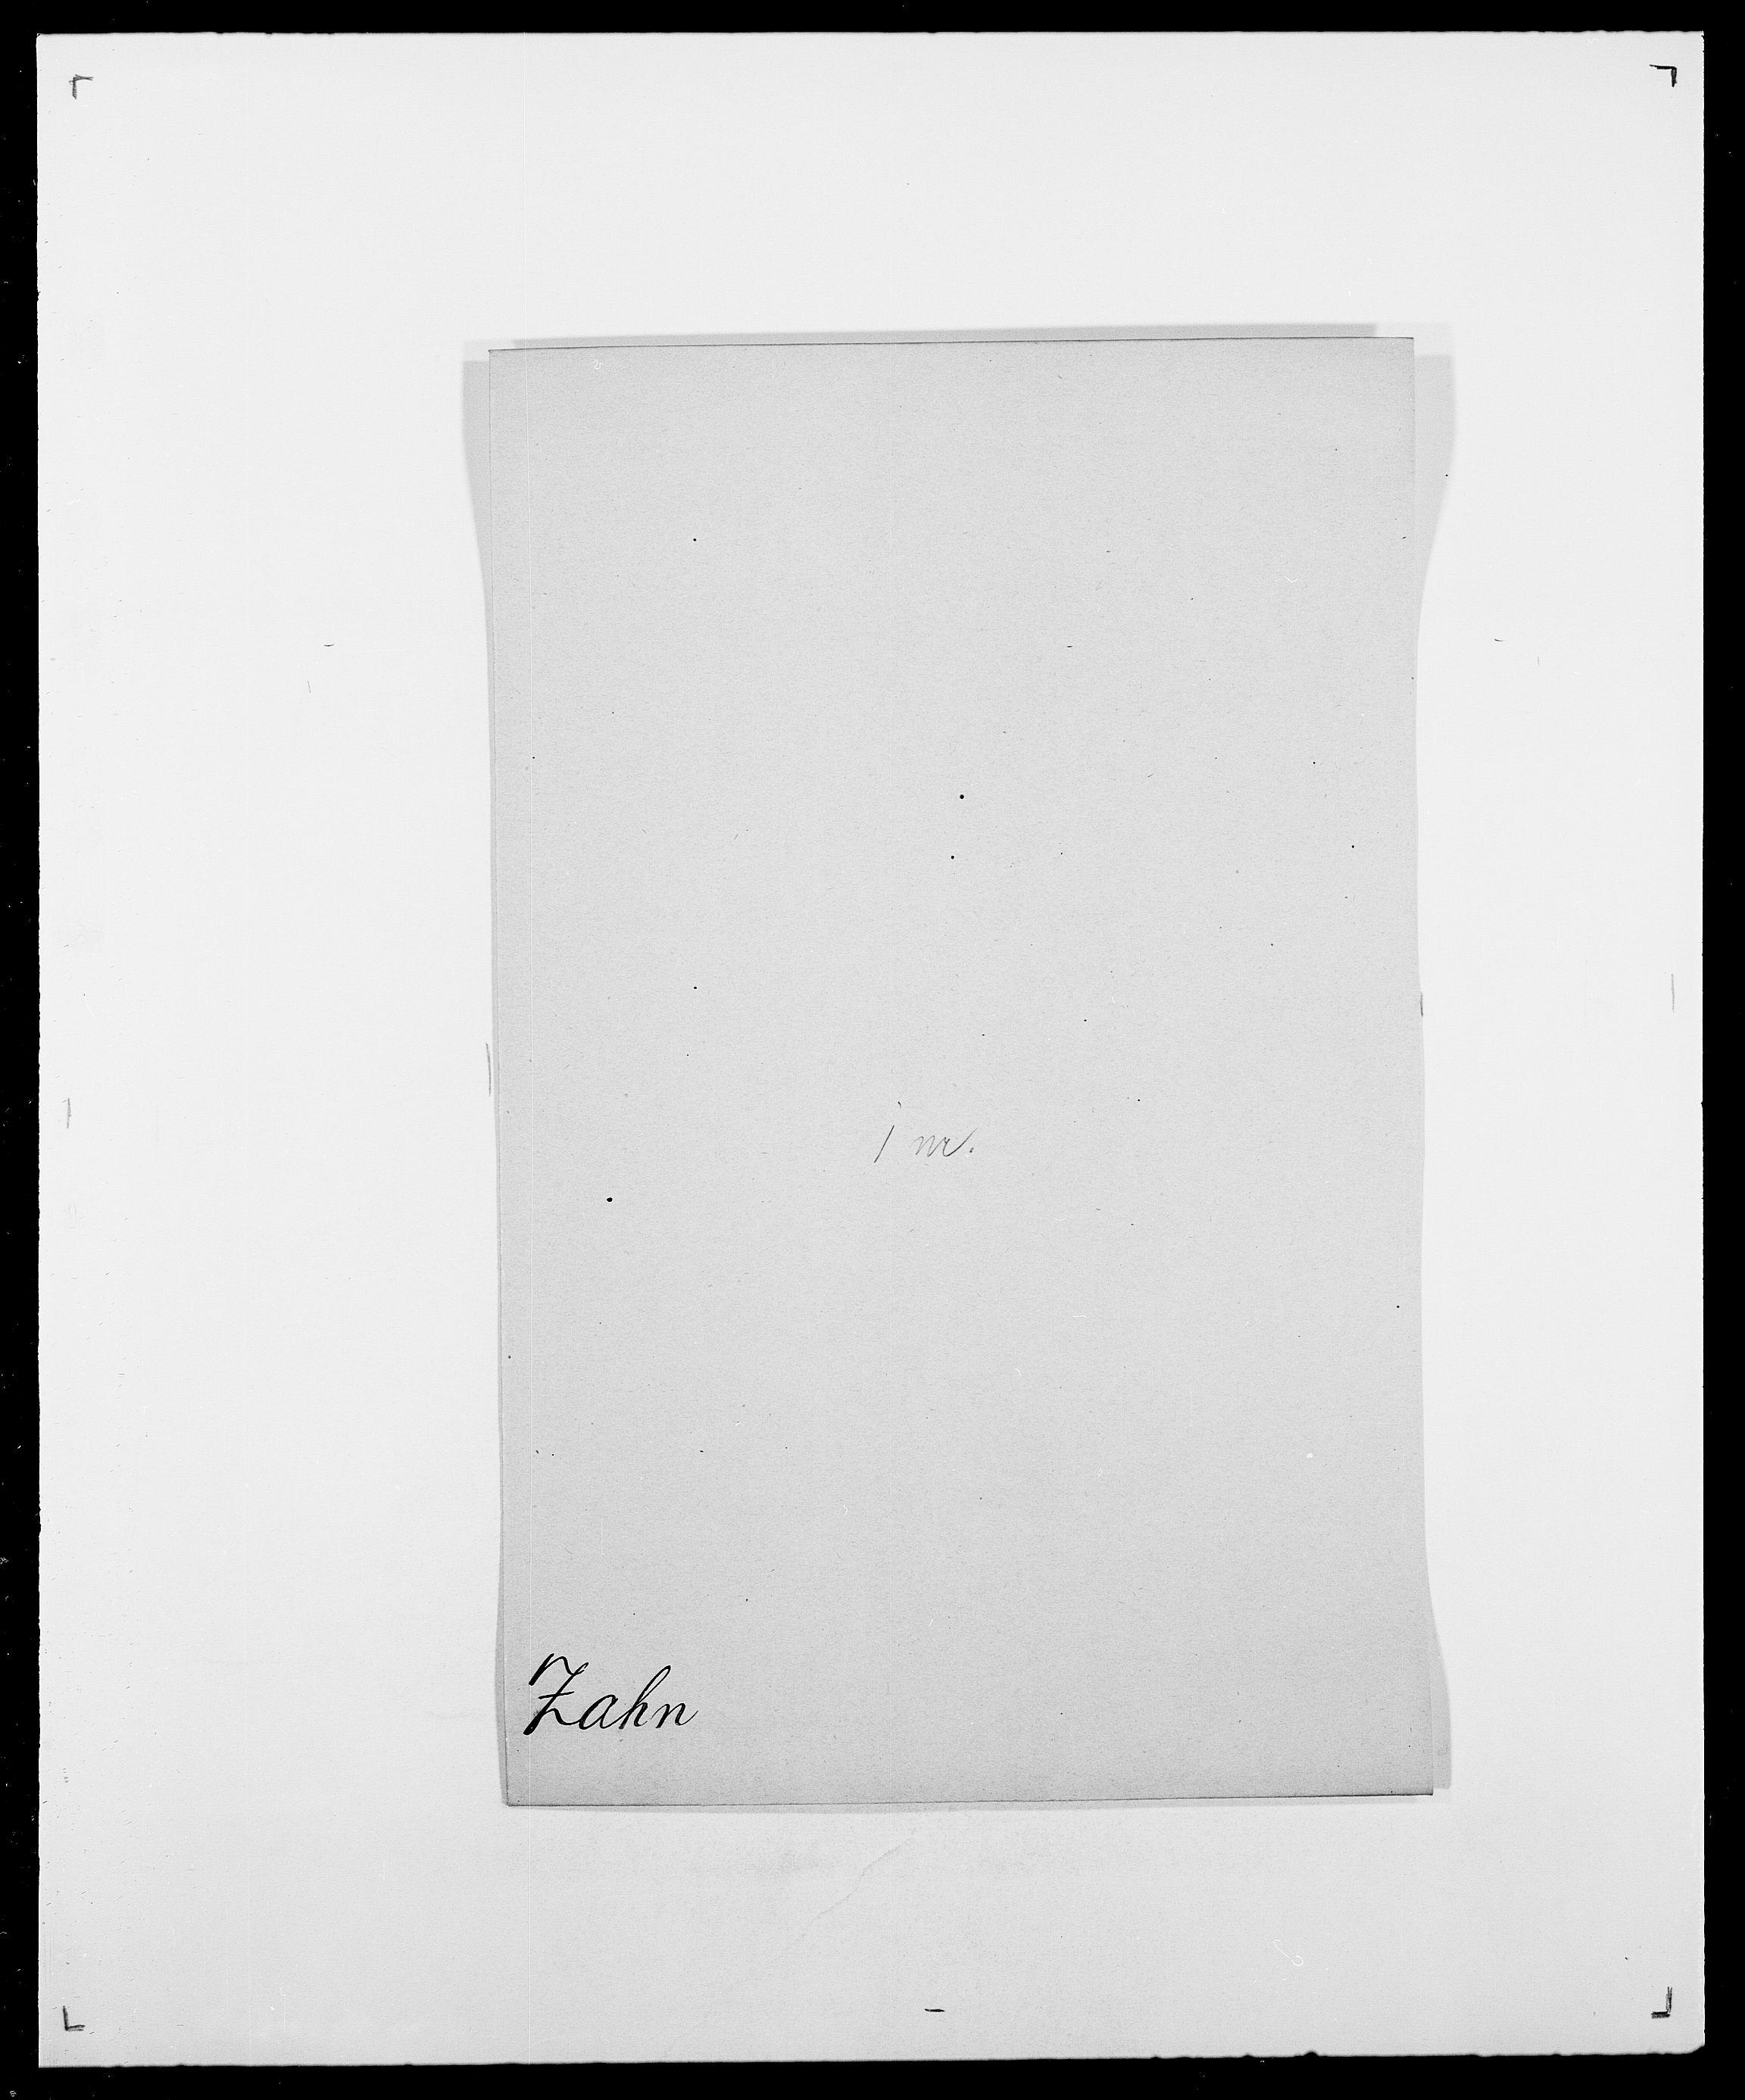 SAO, Delgobe, Charles Antoine - samling, D/Da/L0043: Wulfsberg - v. Zanten, s. 84